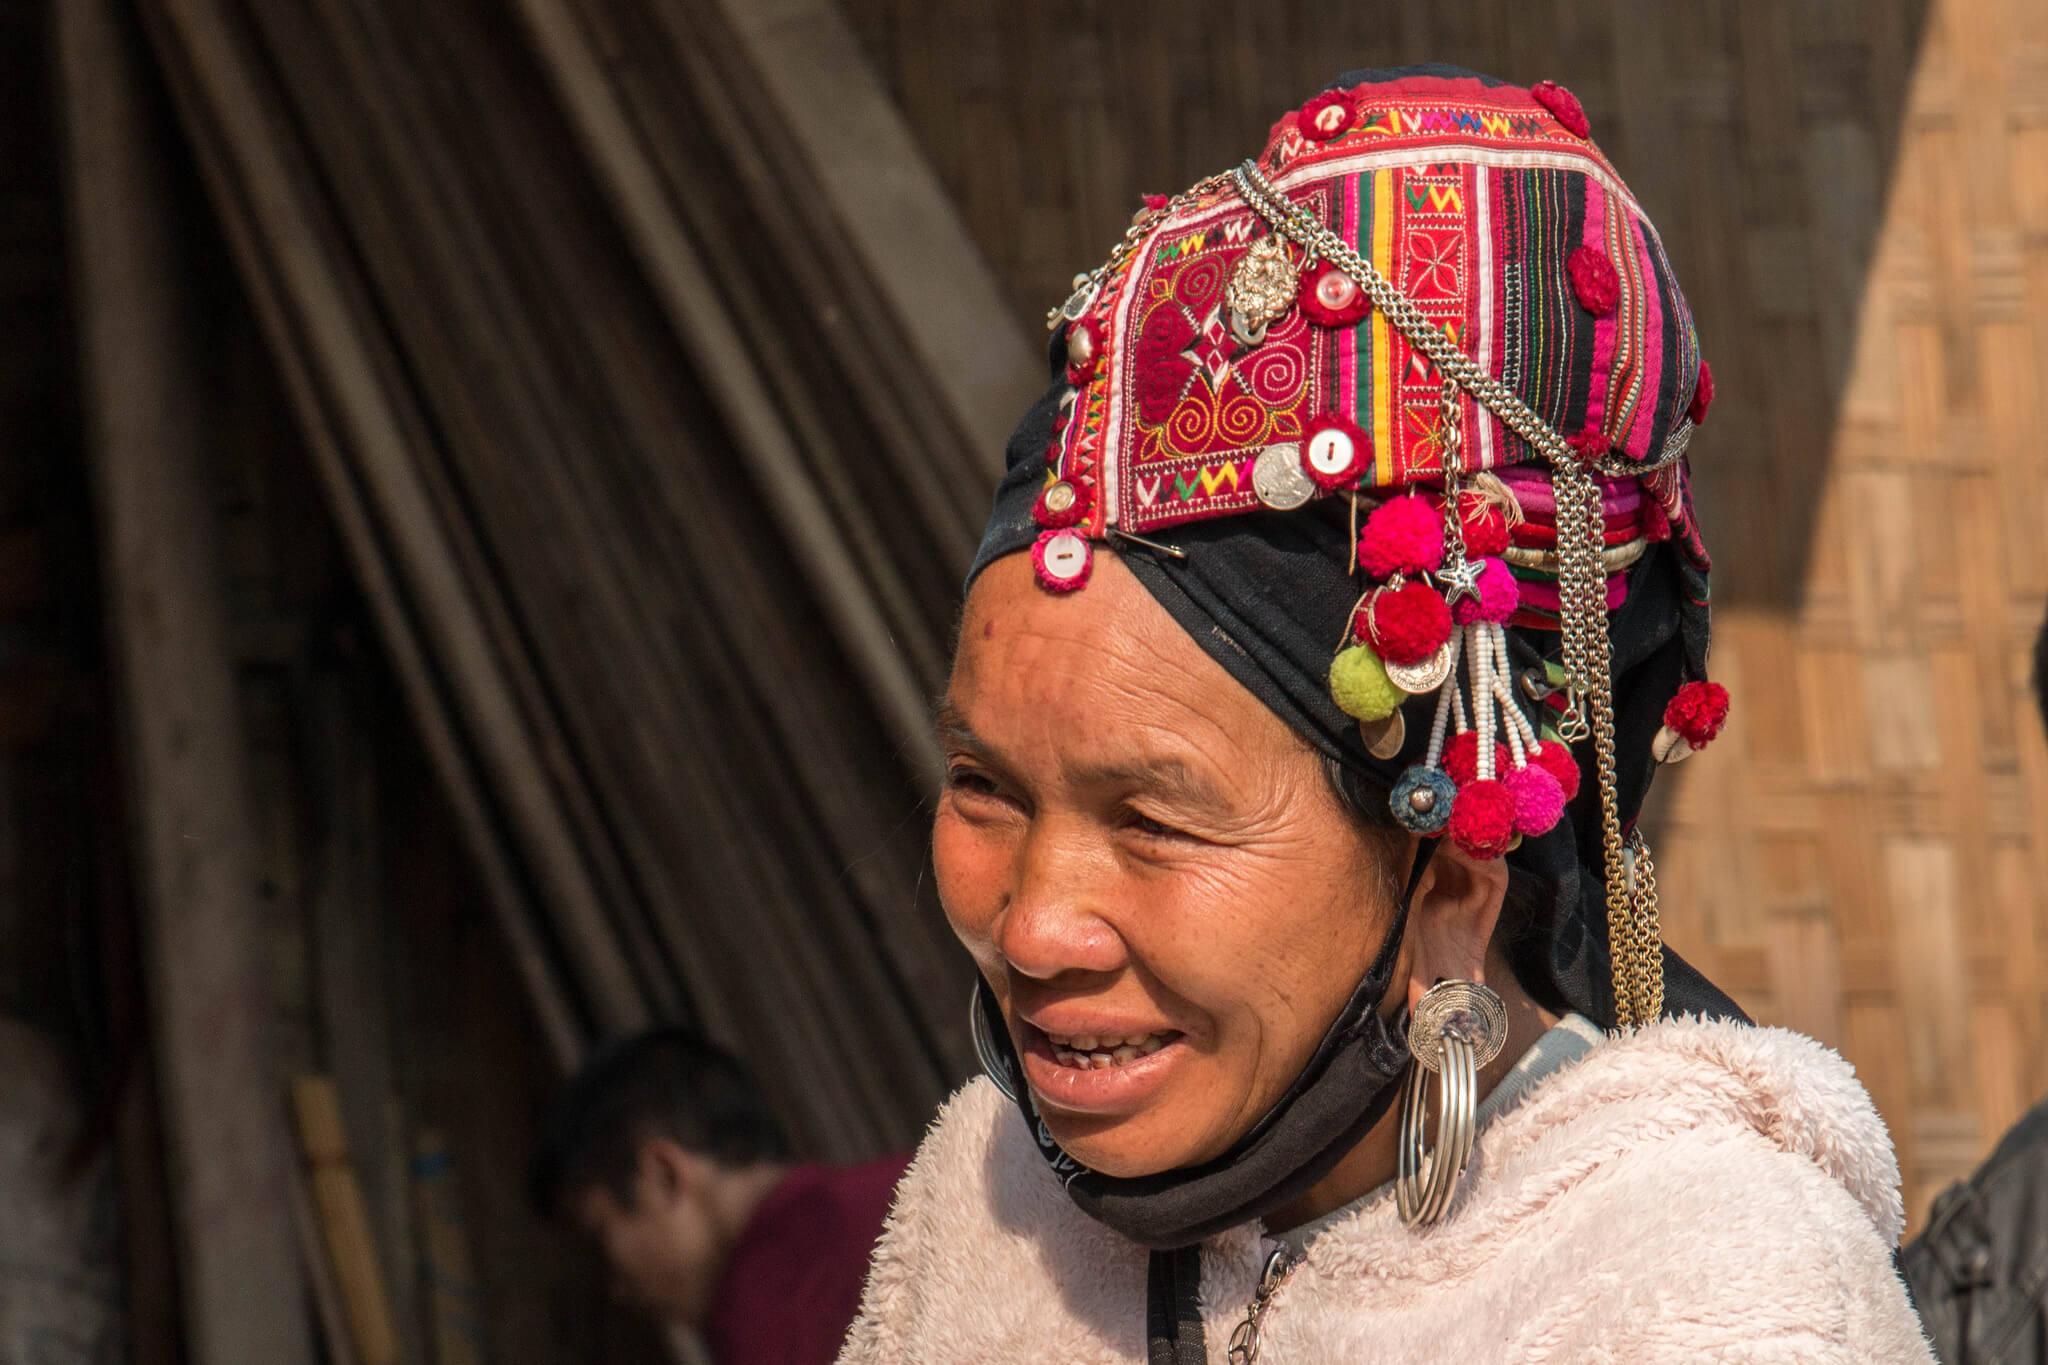 Таиланд, фестиваль Акха Свинг, представительница племени Акха.